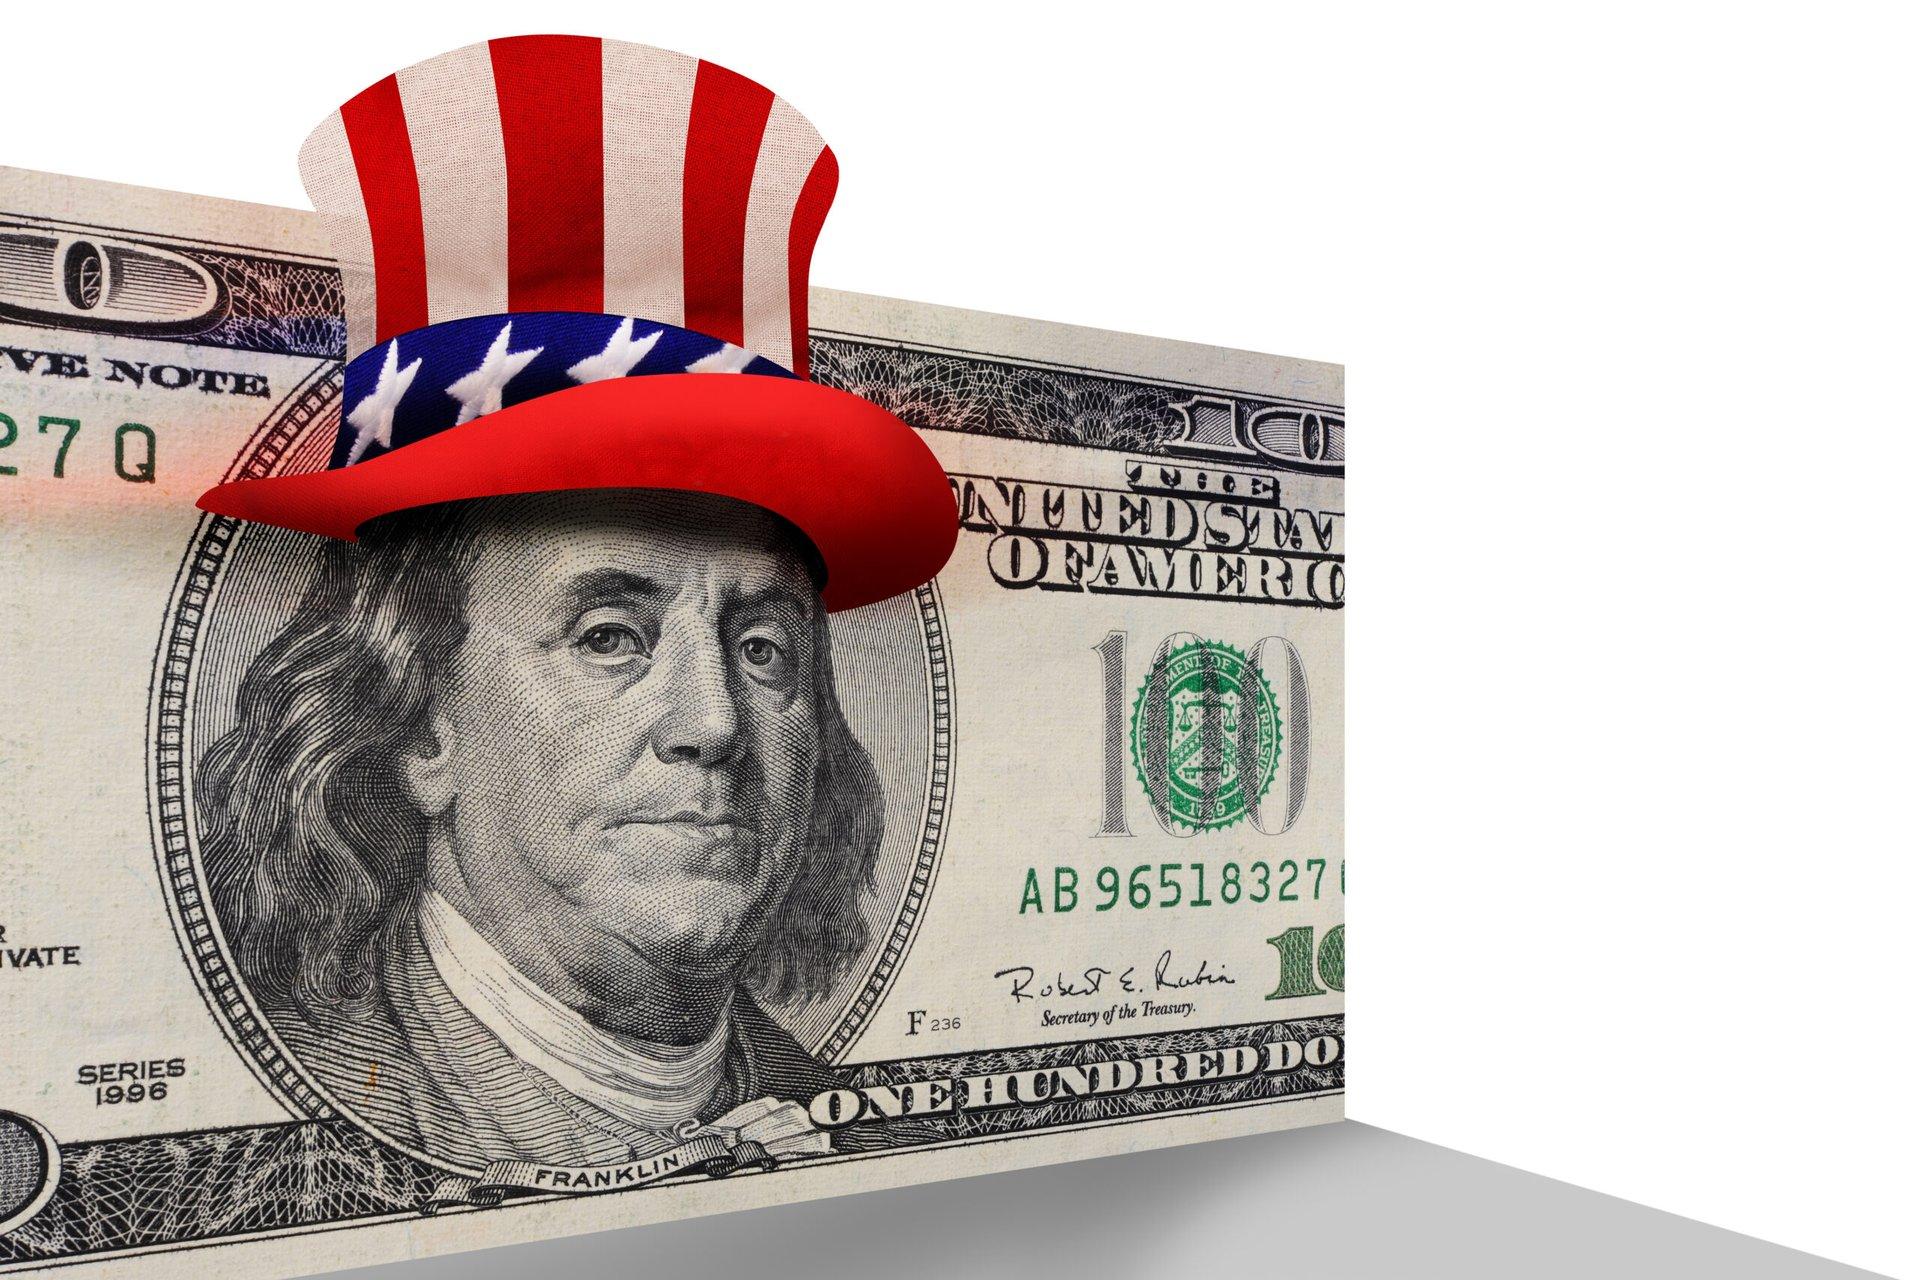 Ben Franklin on a $100 bill